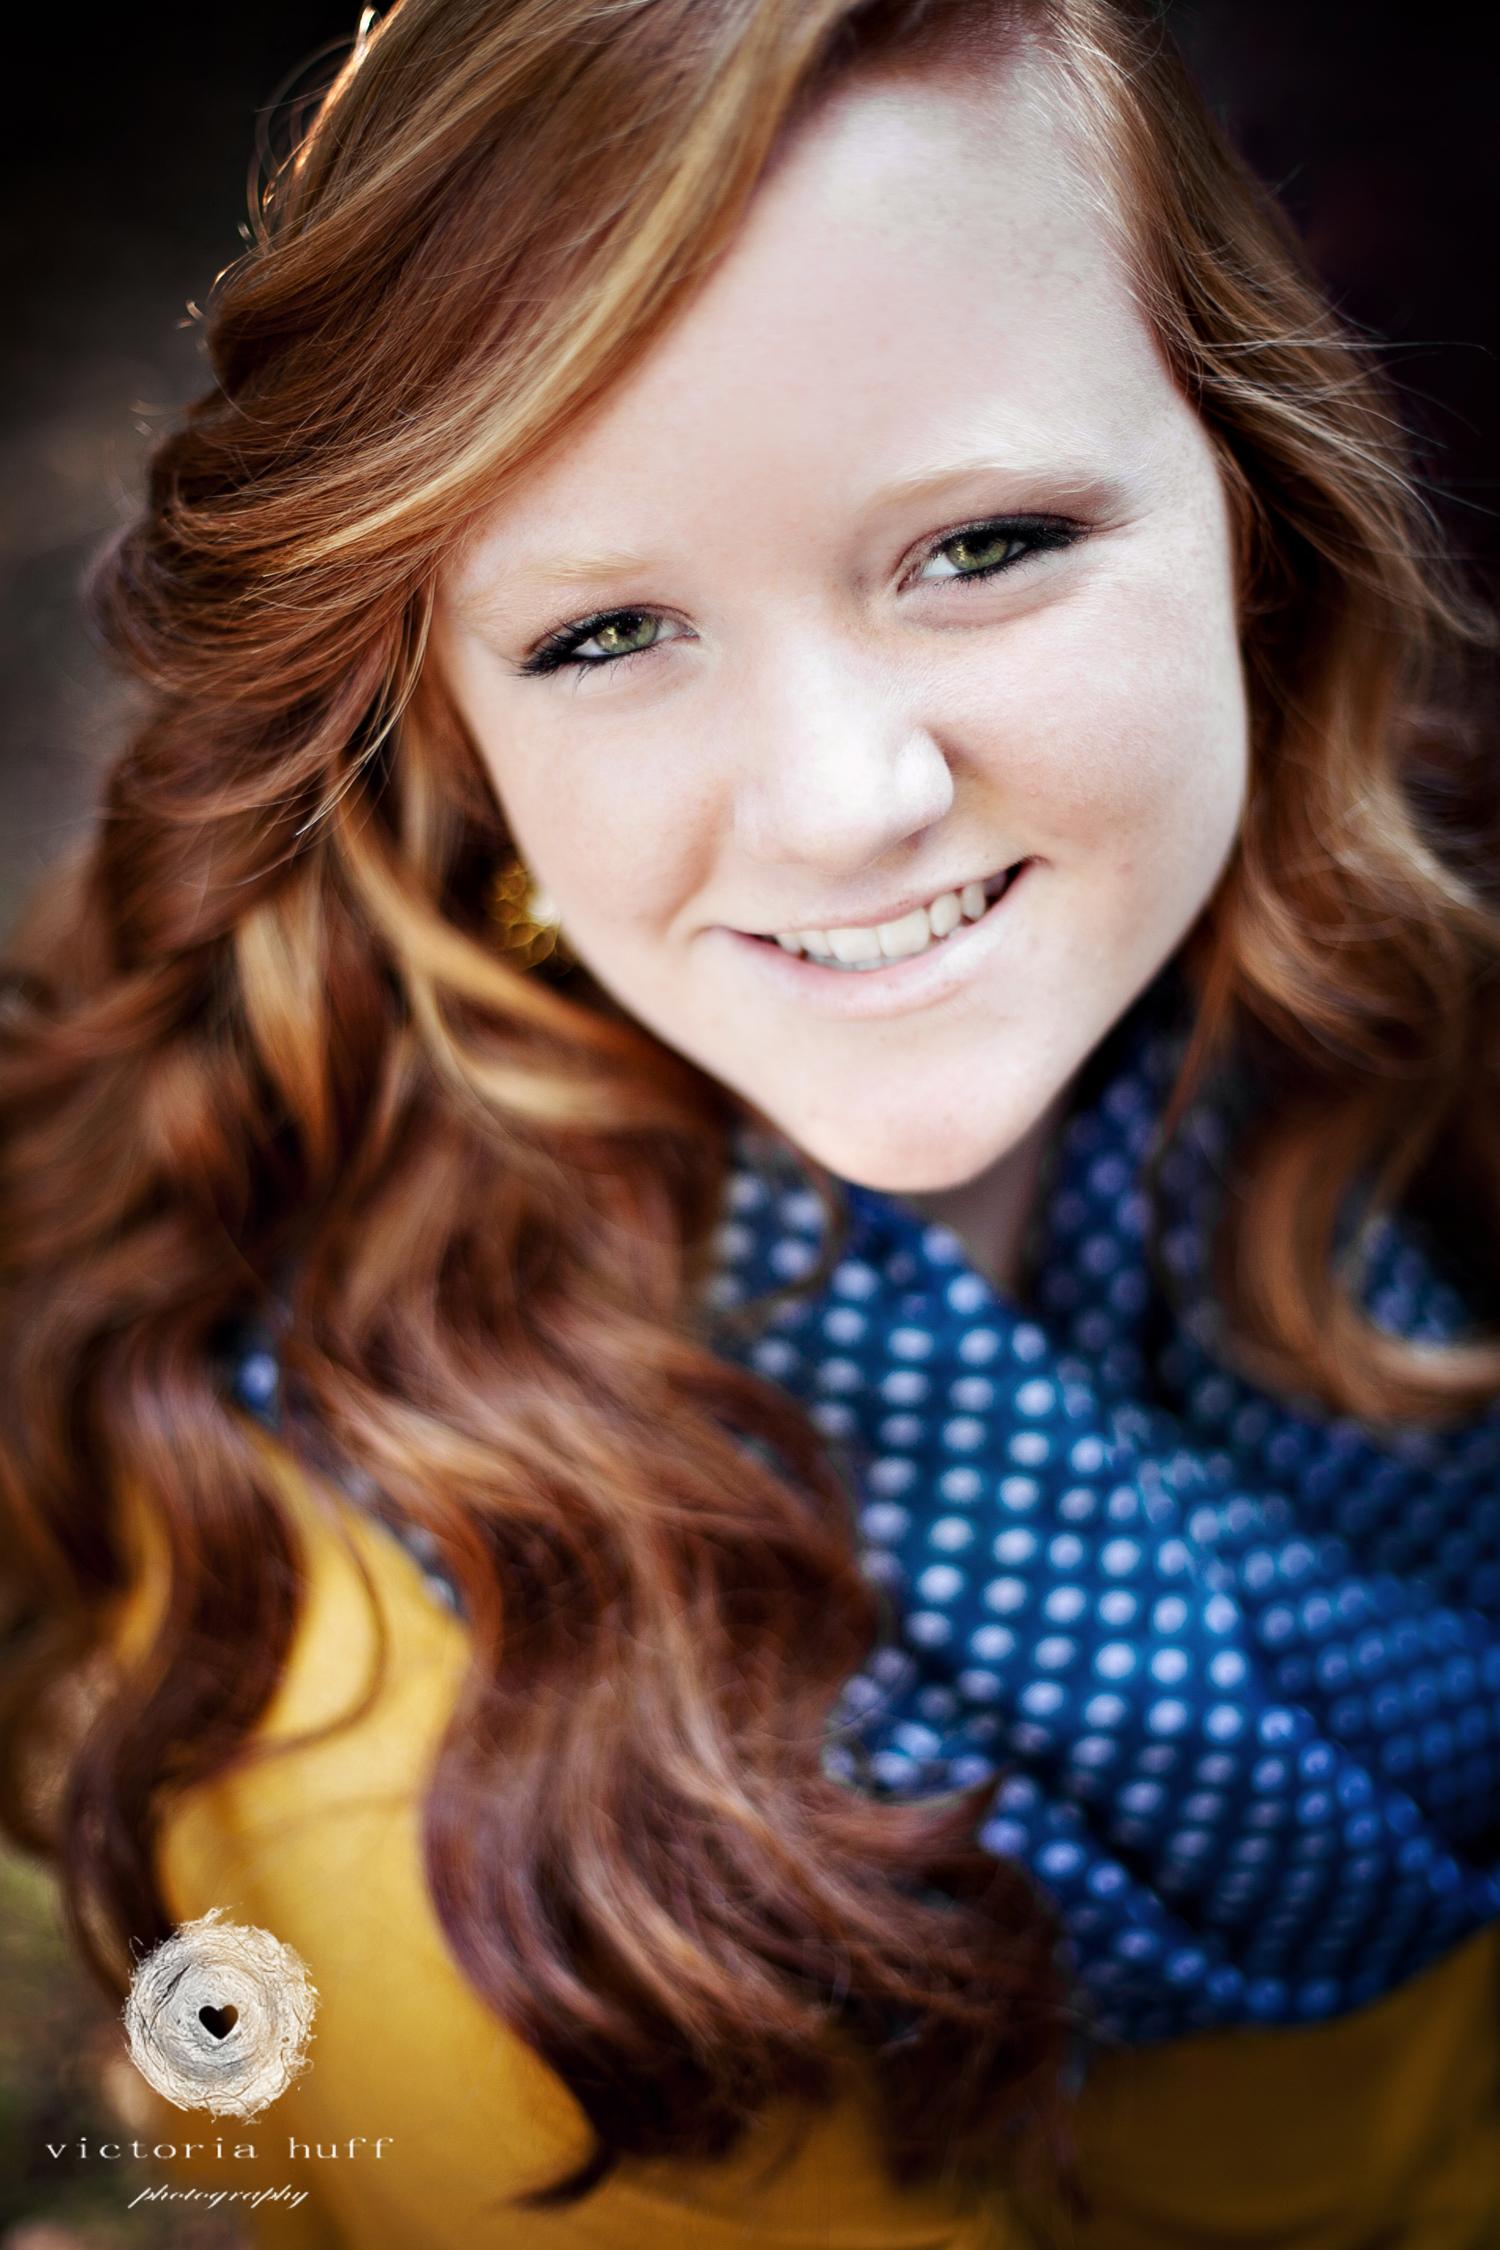 Courtney-Harkins-Senior-Portraits-Jefferson-Athens-Georgia-Red-Hair-Photography-2.jpg